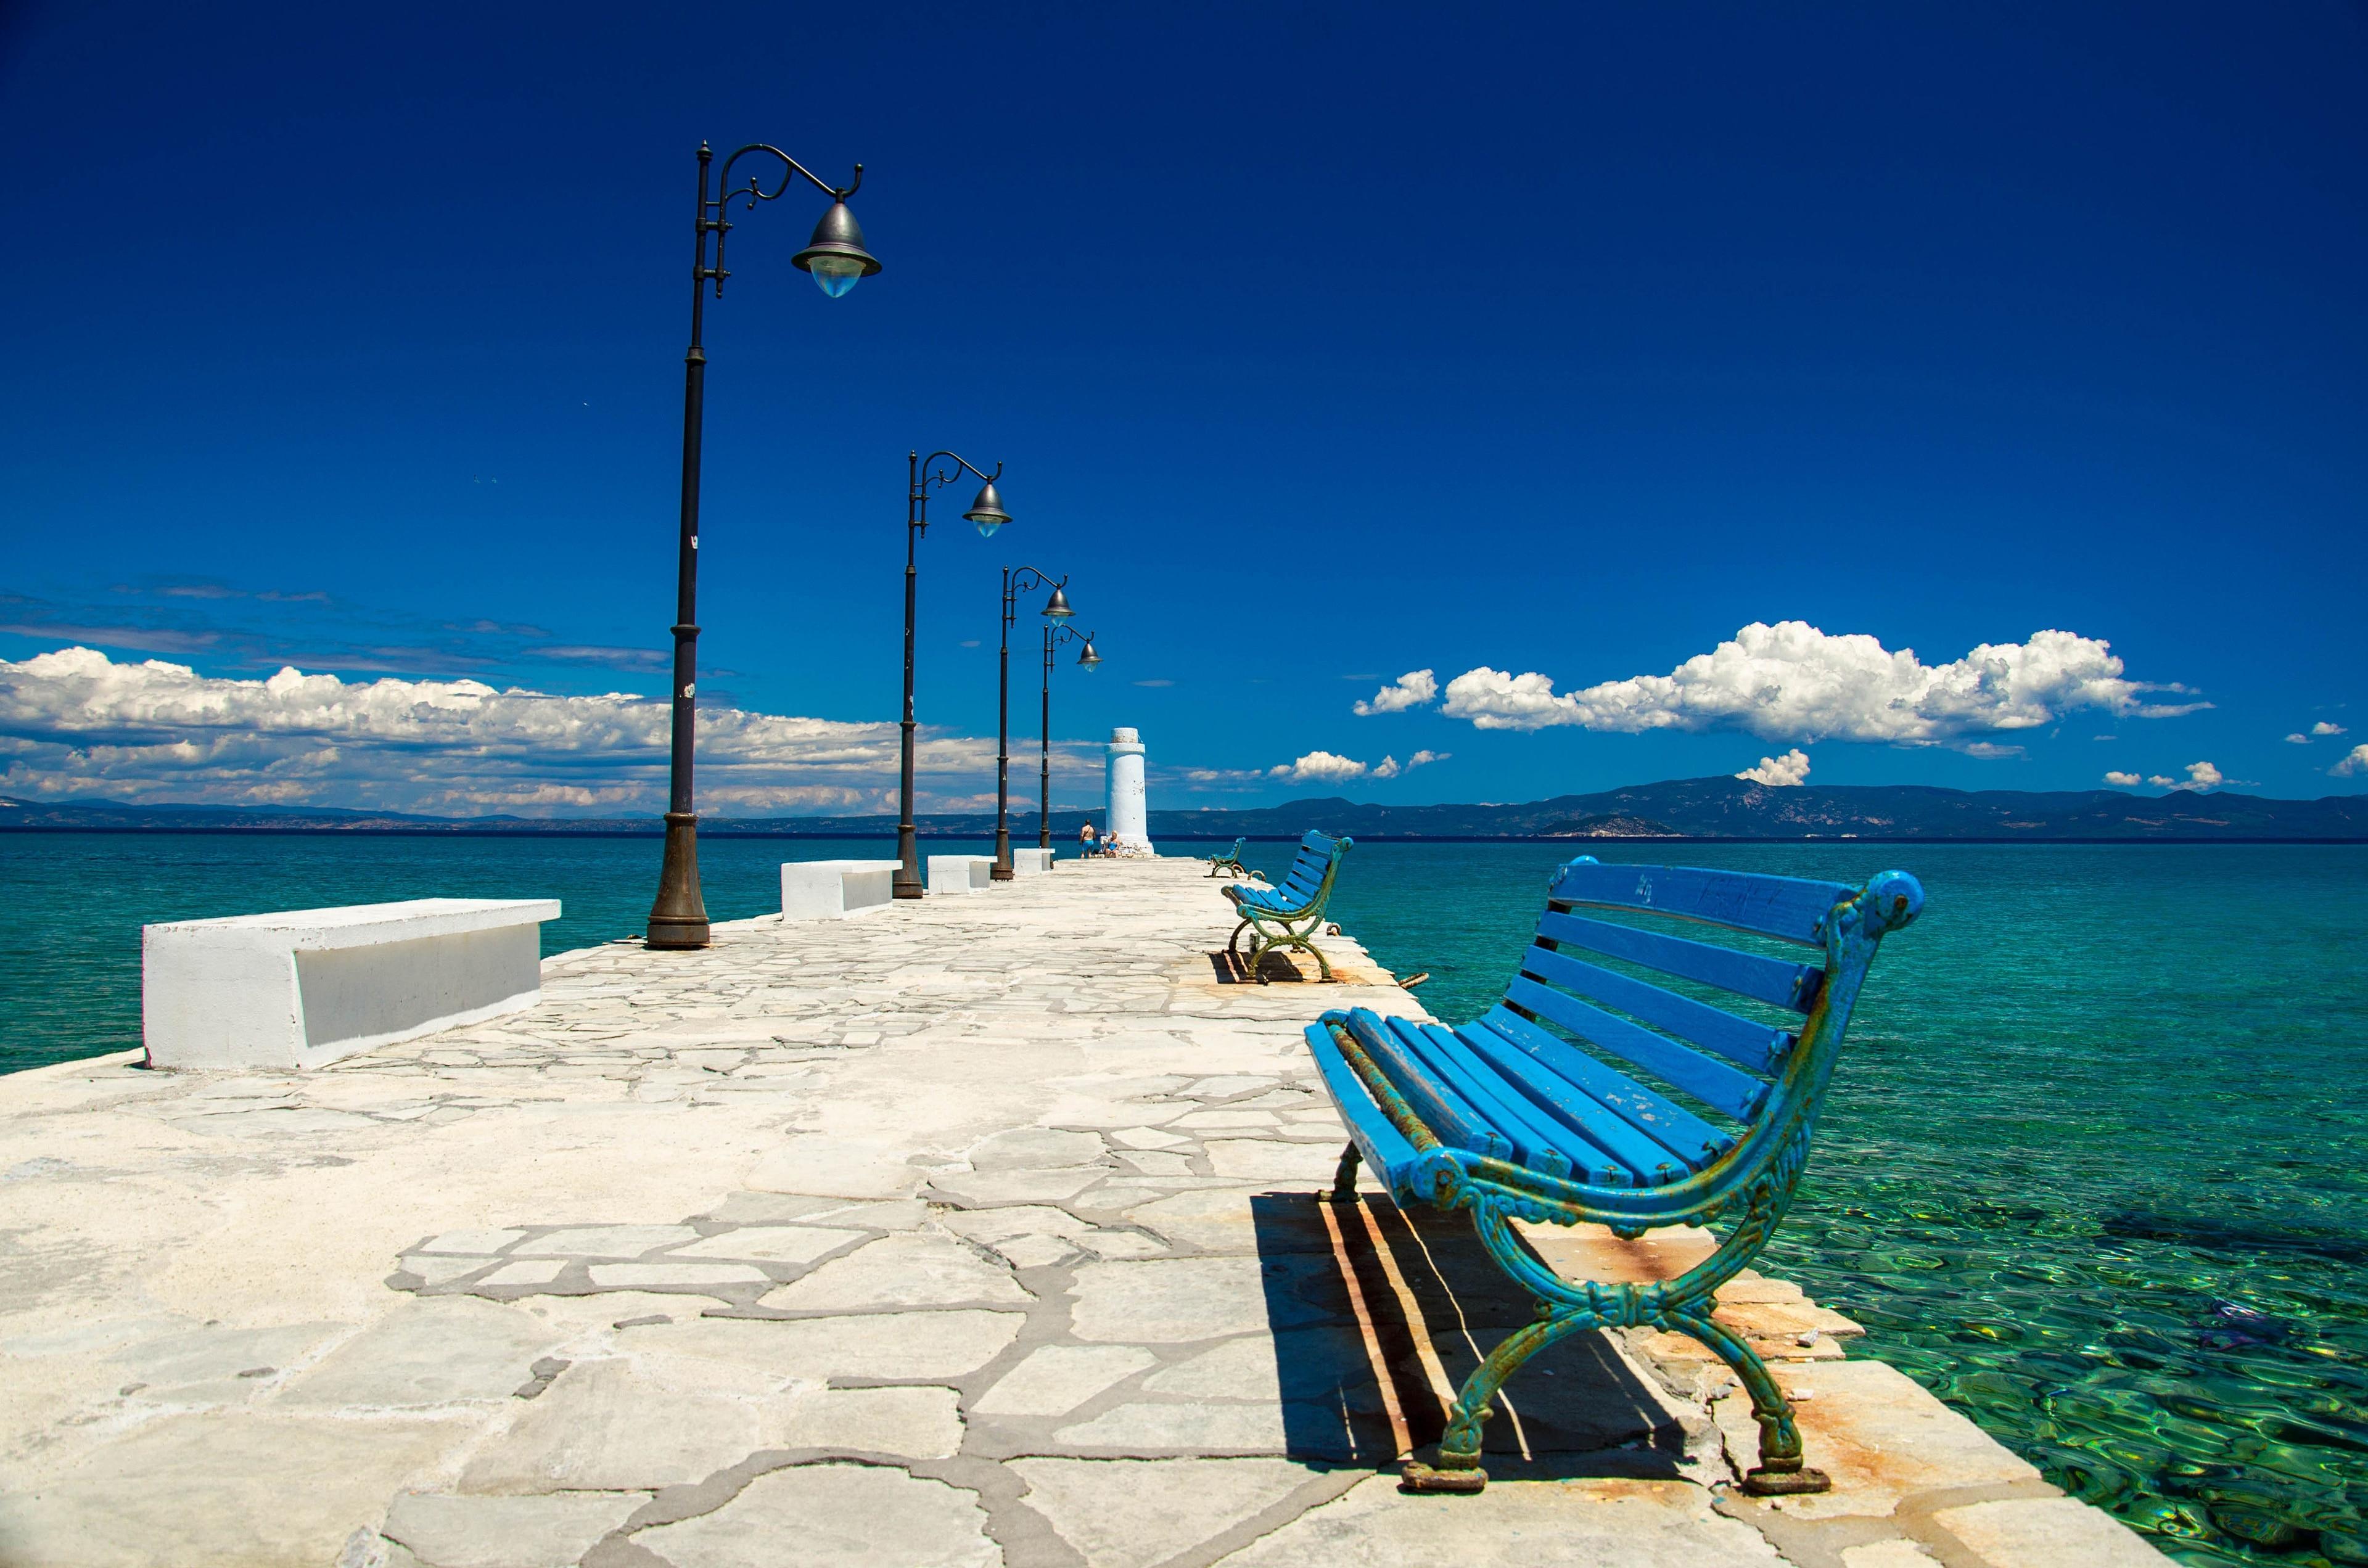 Halkidiki, Central Macedonia, Greece